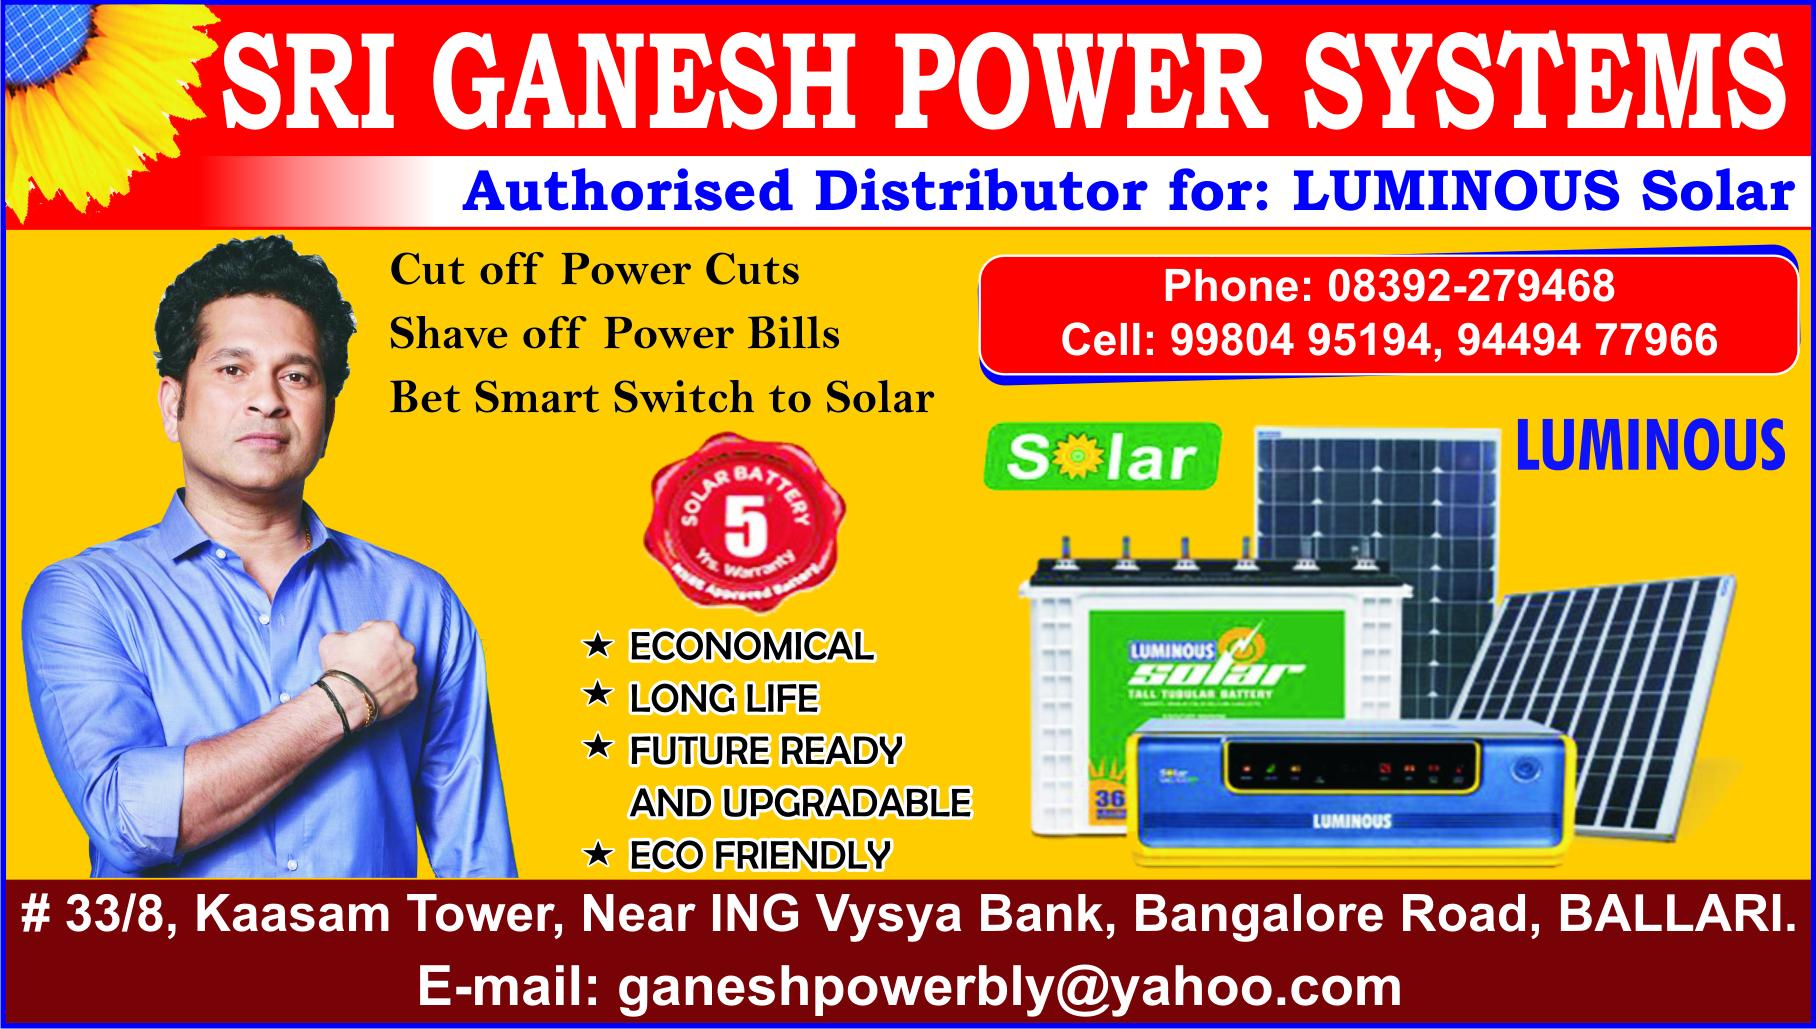 SRI GANESH POWER SYSTEMS